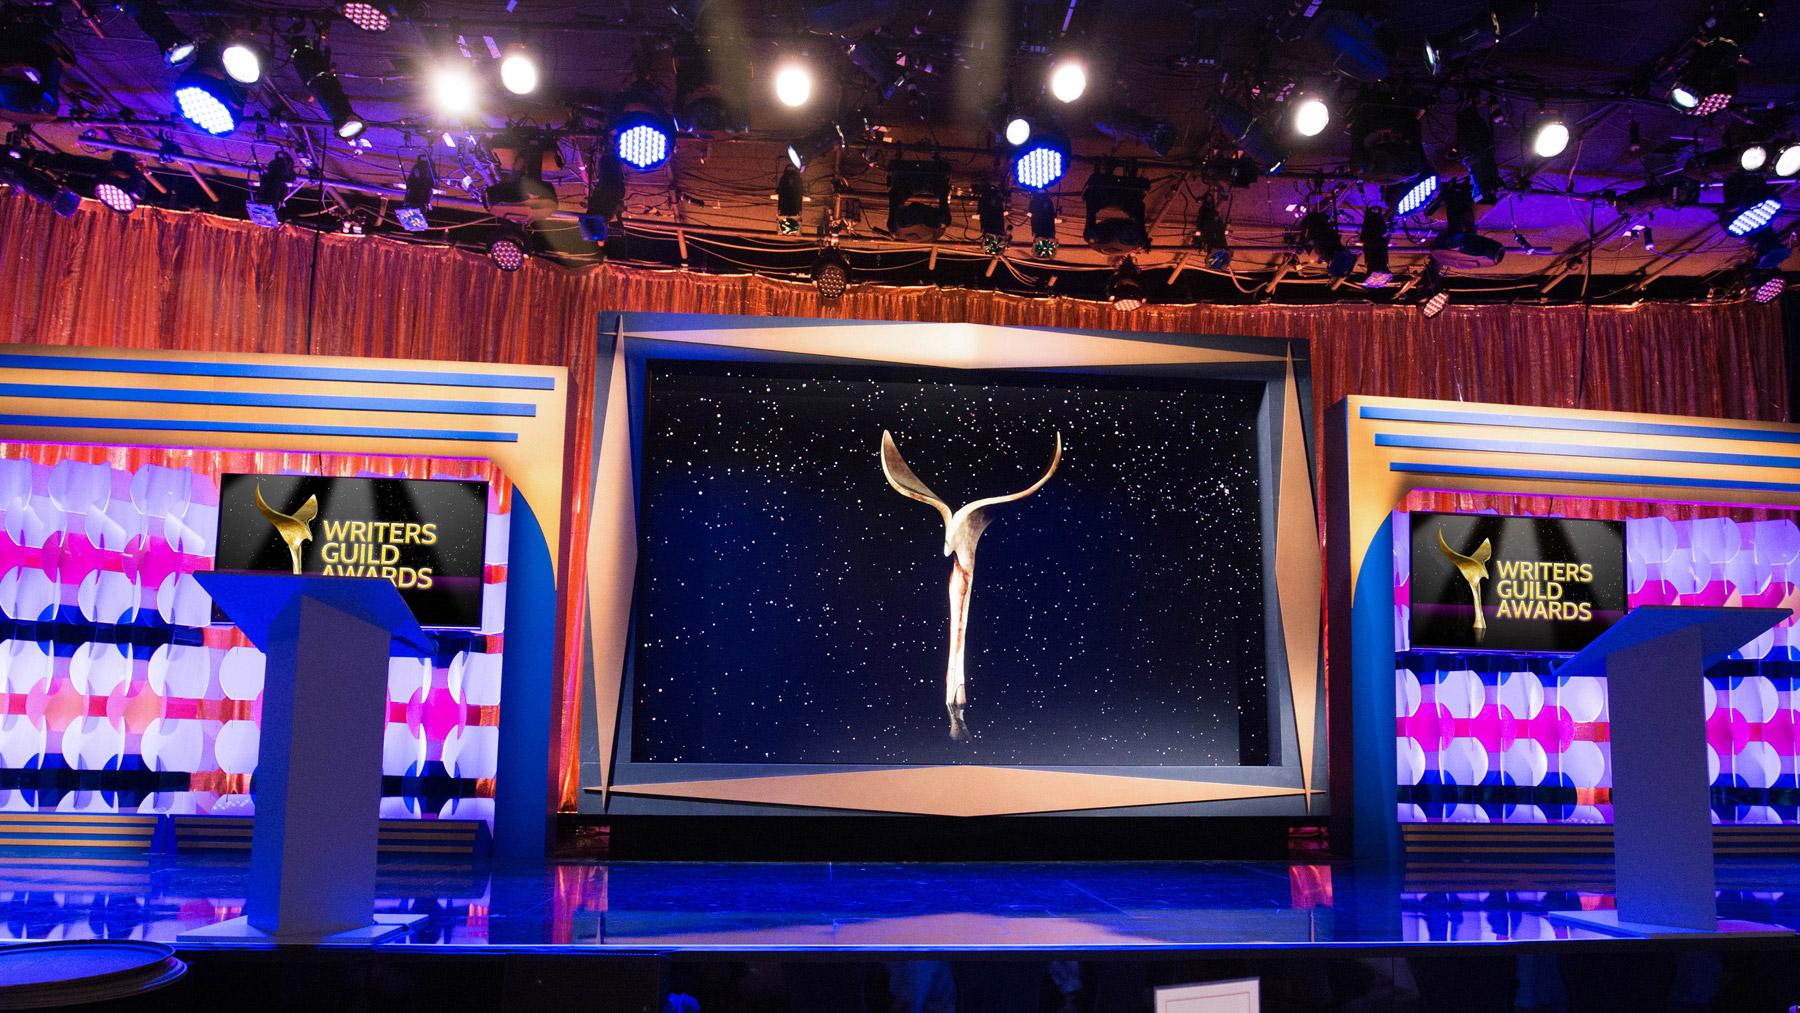 awards-details-slide.jpg